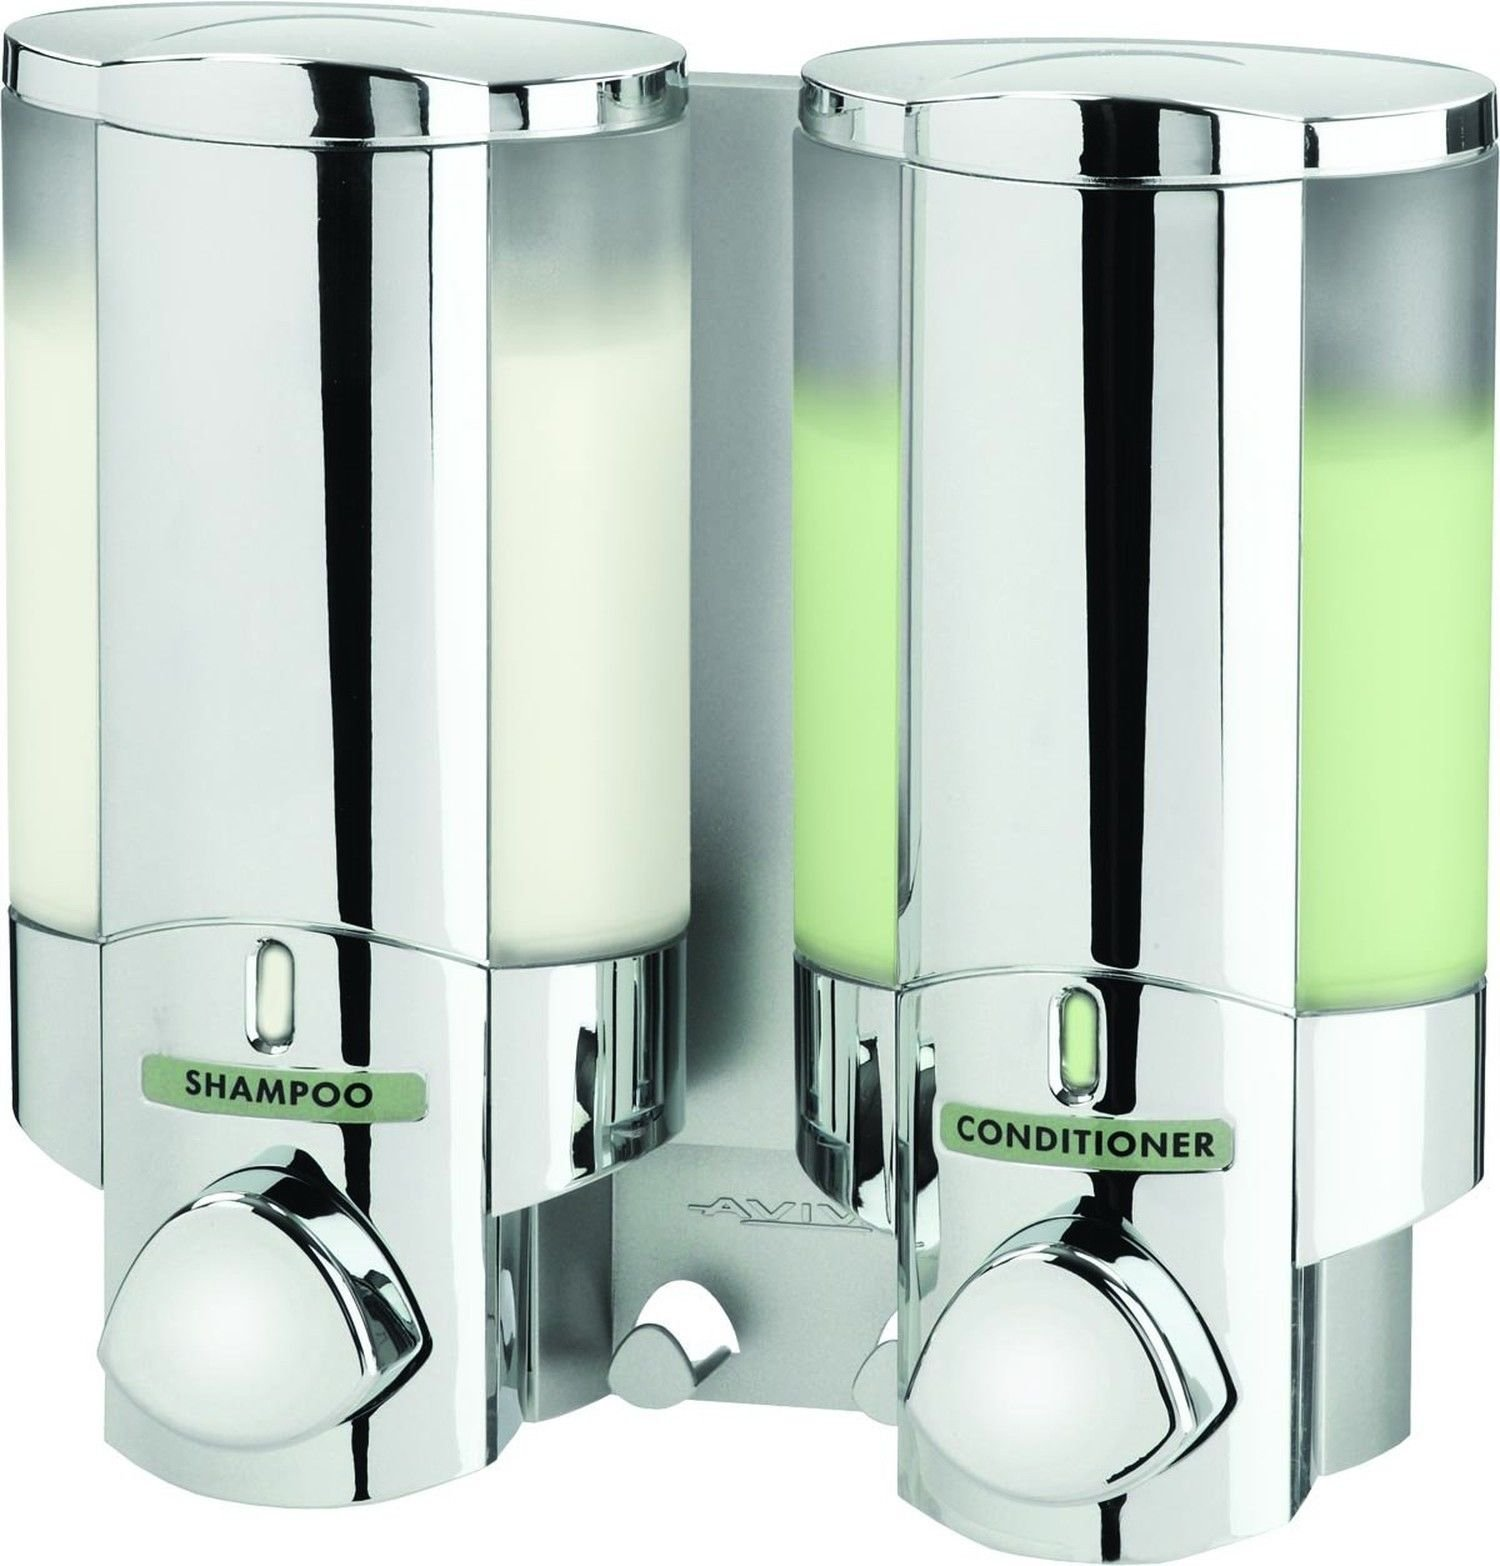 Attractive Design Shampoo Soap Pump Conditioner Dispenser Shower Bathroom Wall Mount Holder new! #32